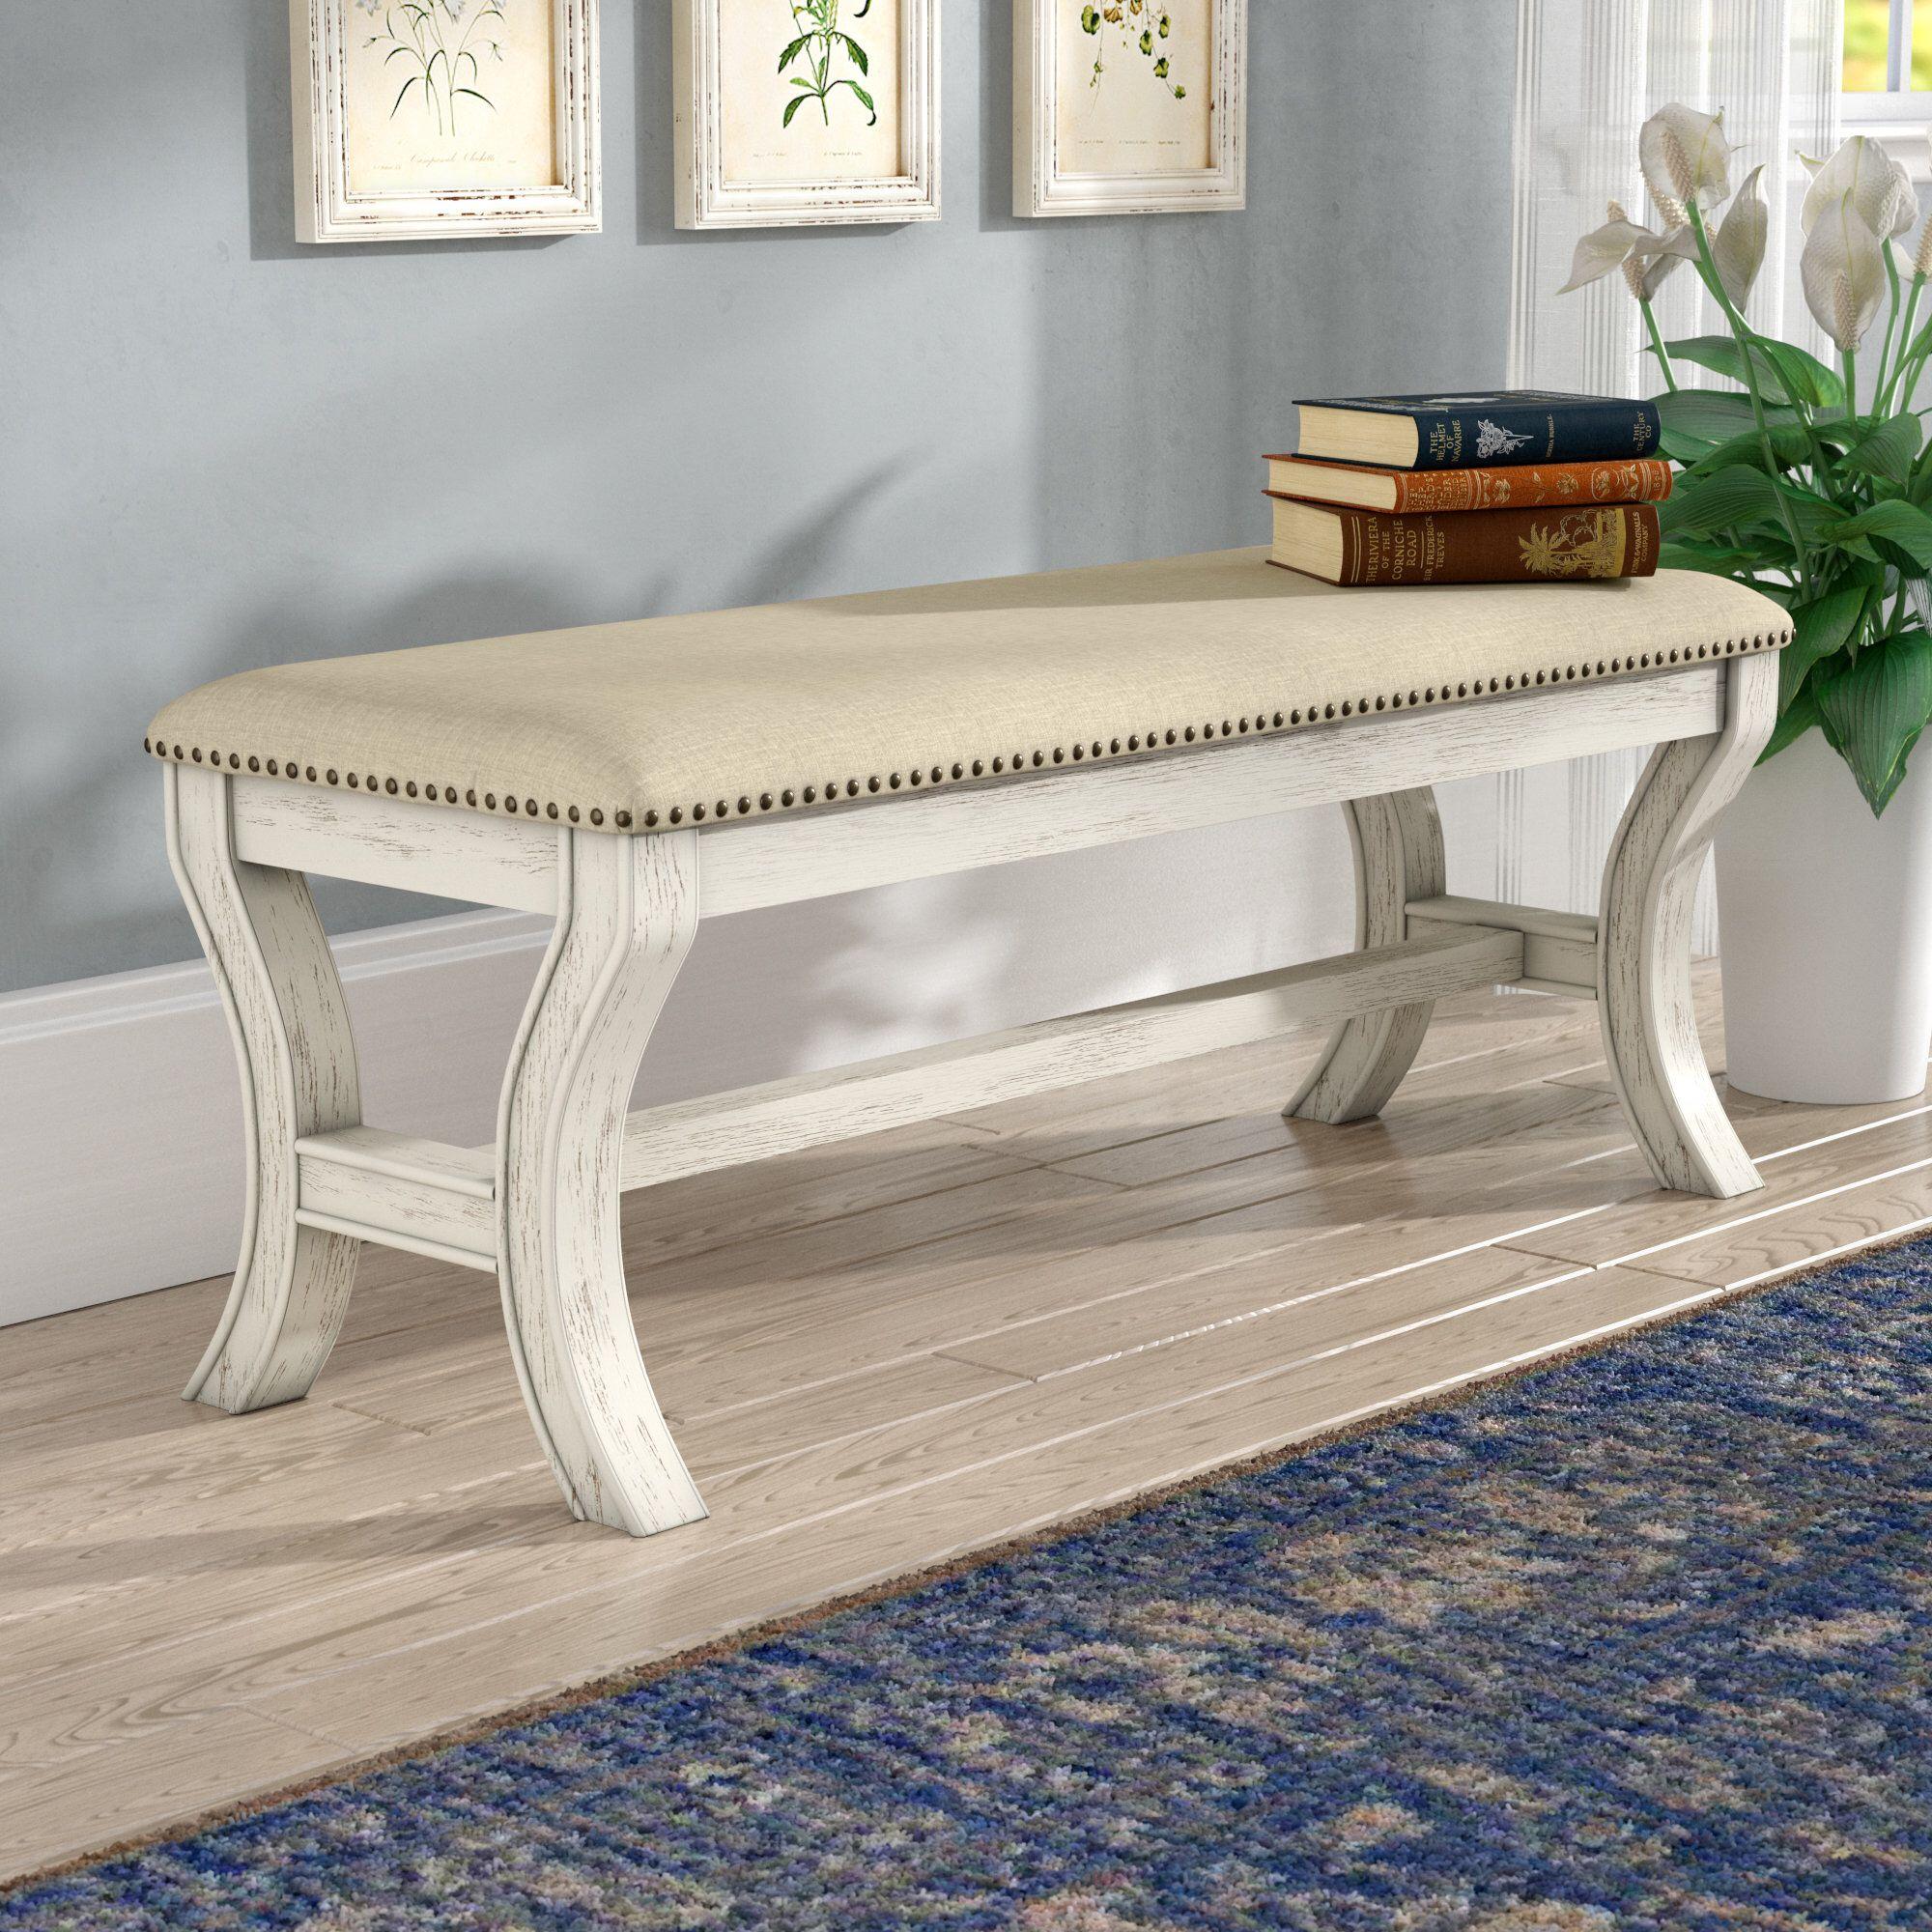 Dole upholstered bench upholstered bench upholster